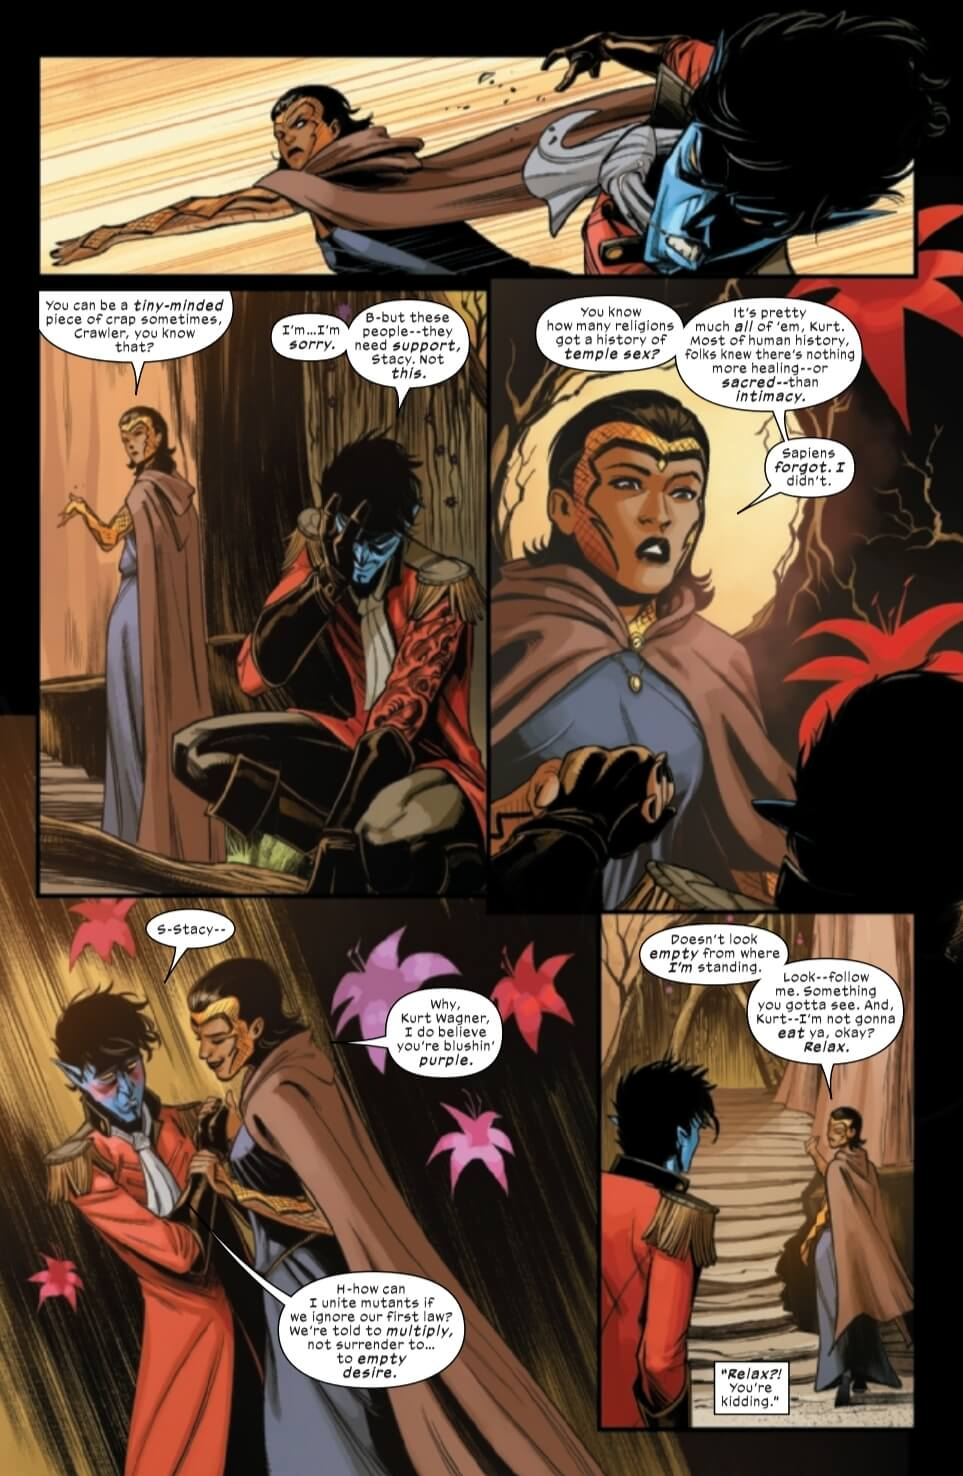 Way of X #3 - Spurrier, Quinn, Tartaglia, Cowles - Marvel Comics June 23rd, 2021